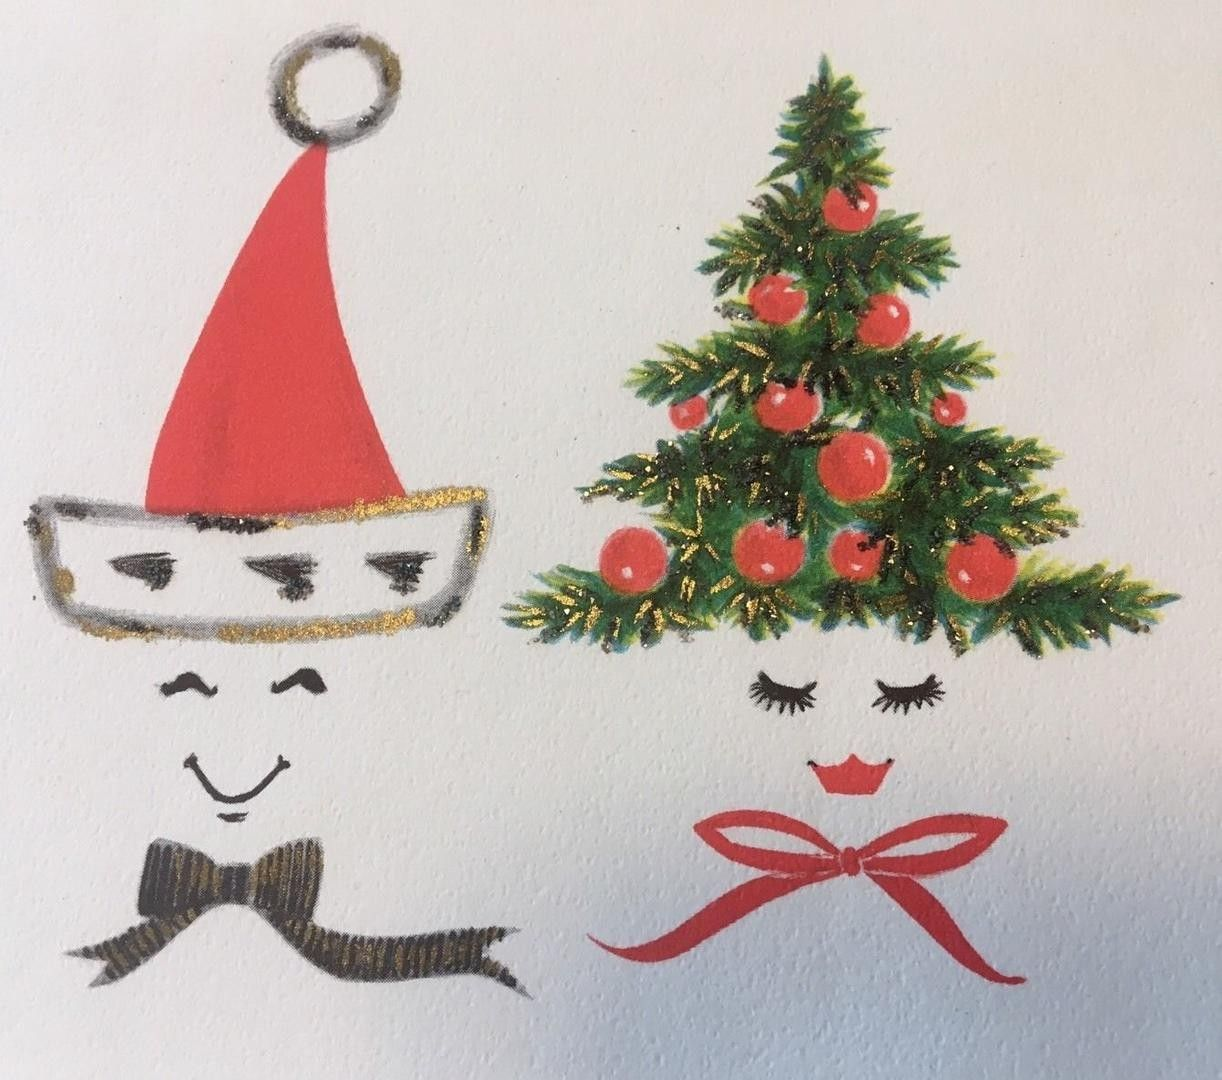 5306091ce1729 Vintage Christmas Card Anthro Family 2 Of Us Tree Ornament Santa Hat  Mistletoe